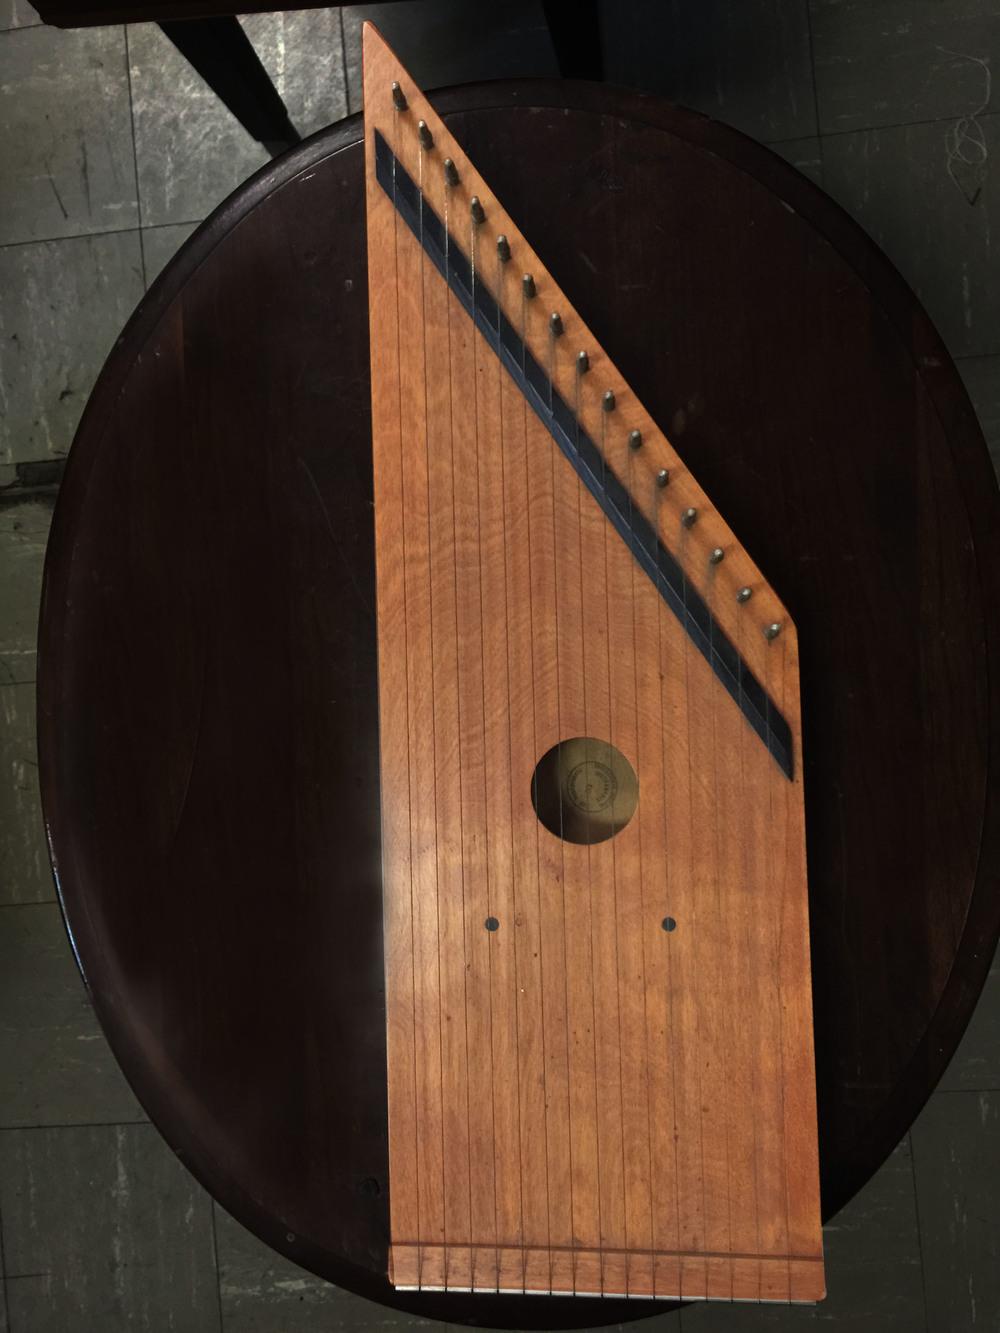 Instruments: Dulcimer